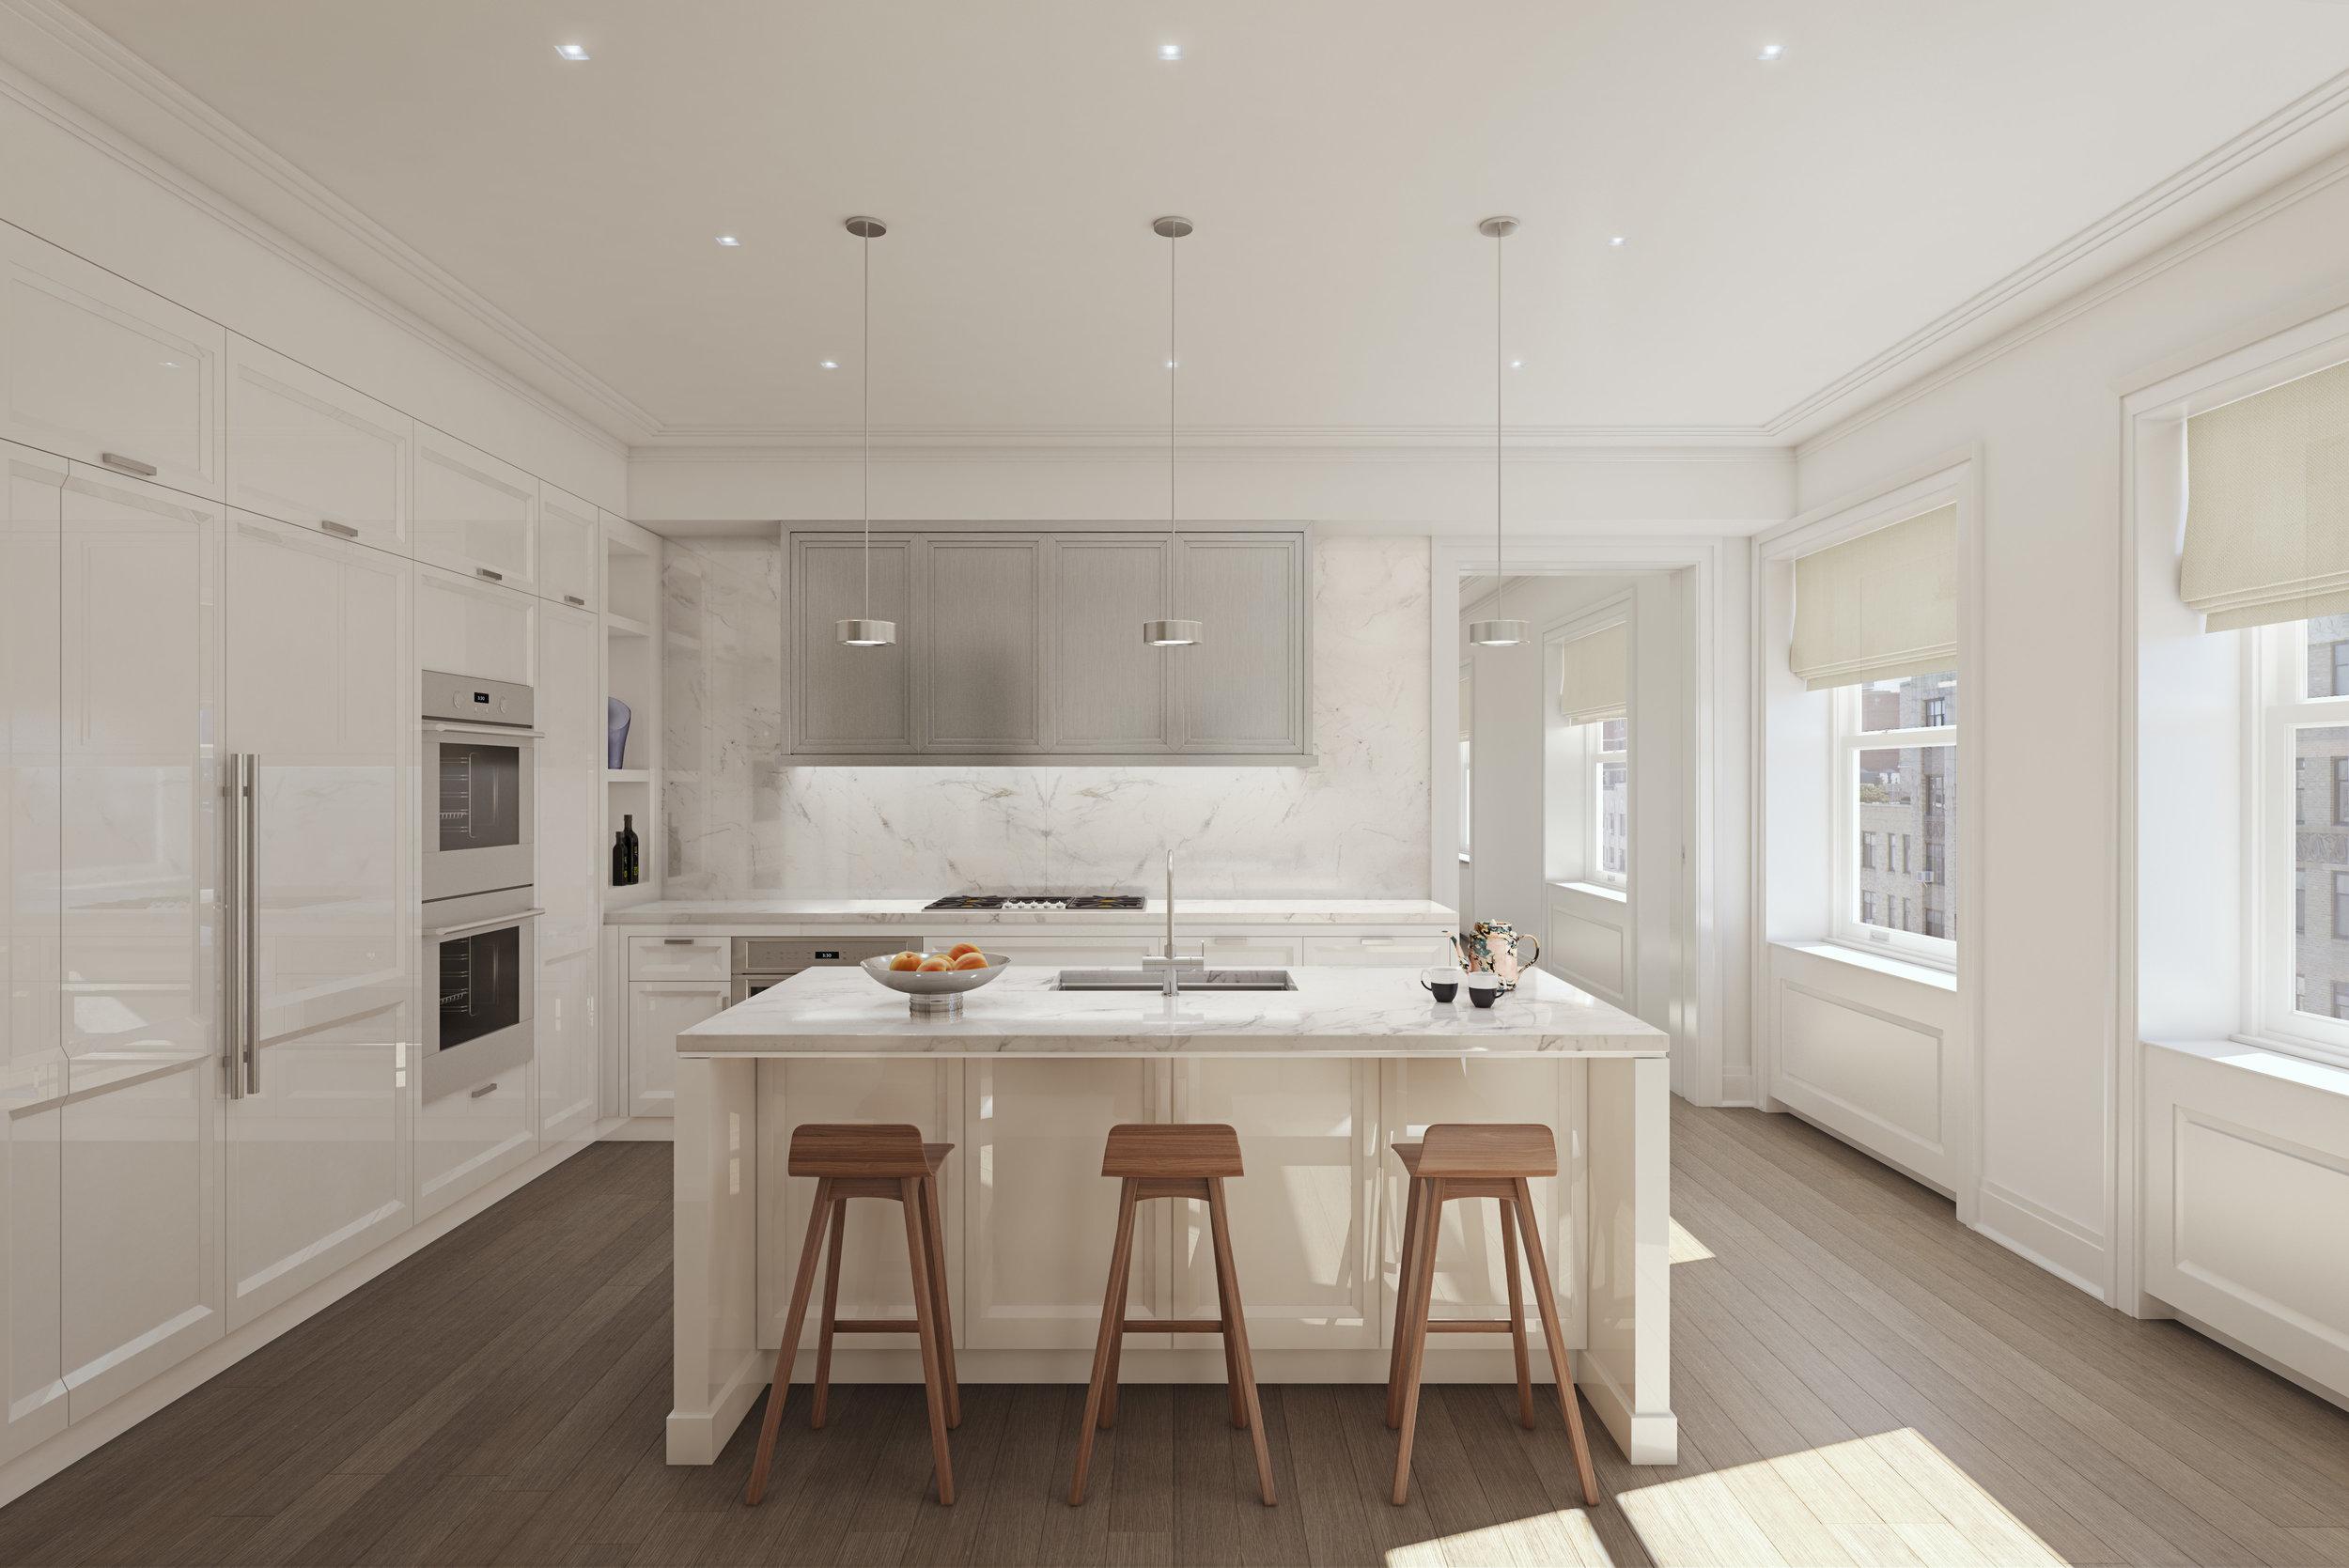 DBOX_HFZ_The Belnord_Residence_Typical Kitchen A-Island.jpg